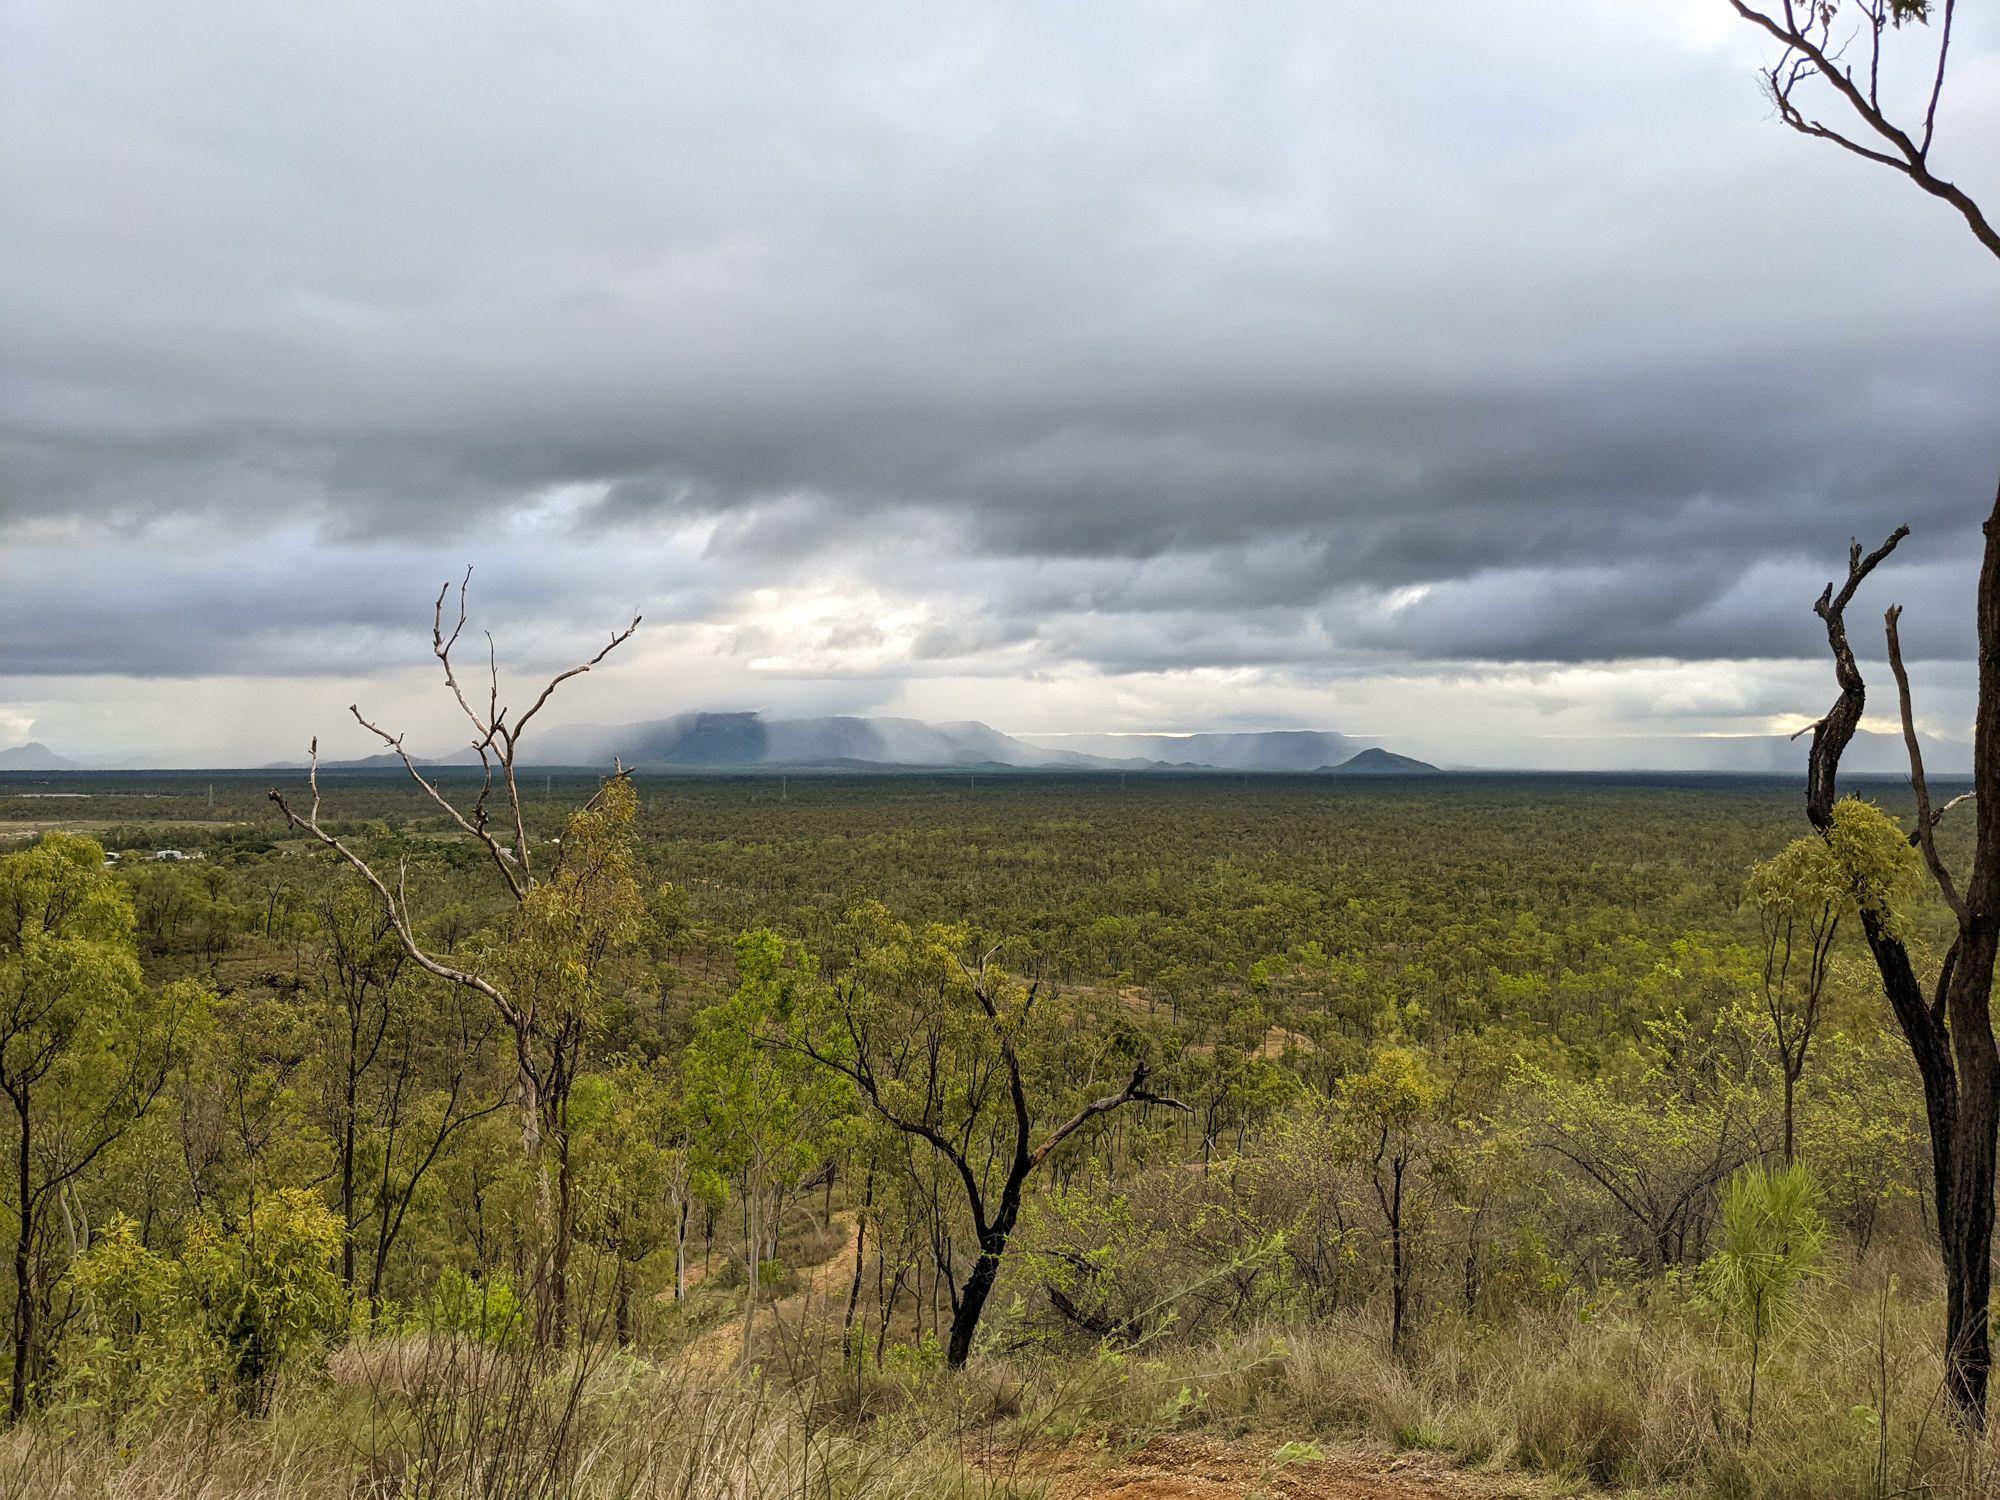 bohle views to frederick peak hervey range